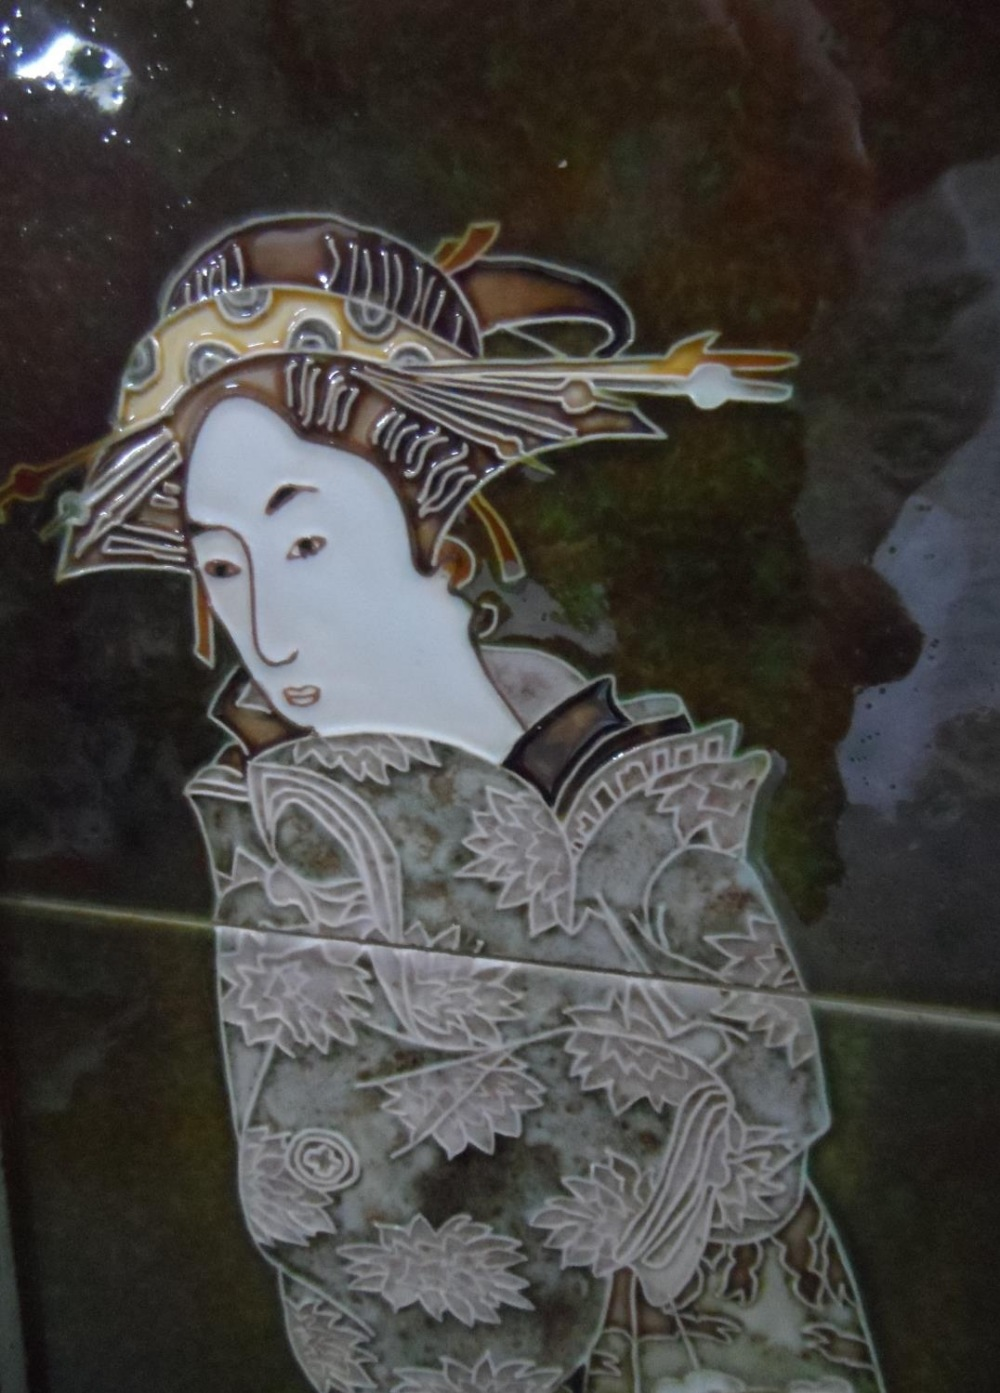 Signed 3-tiled Japanese geisha girl, in thin wood frame, 64 x 24 cm - Image 3 of 5